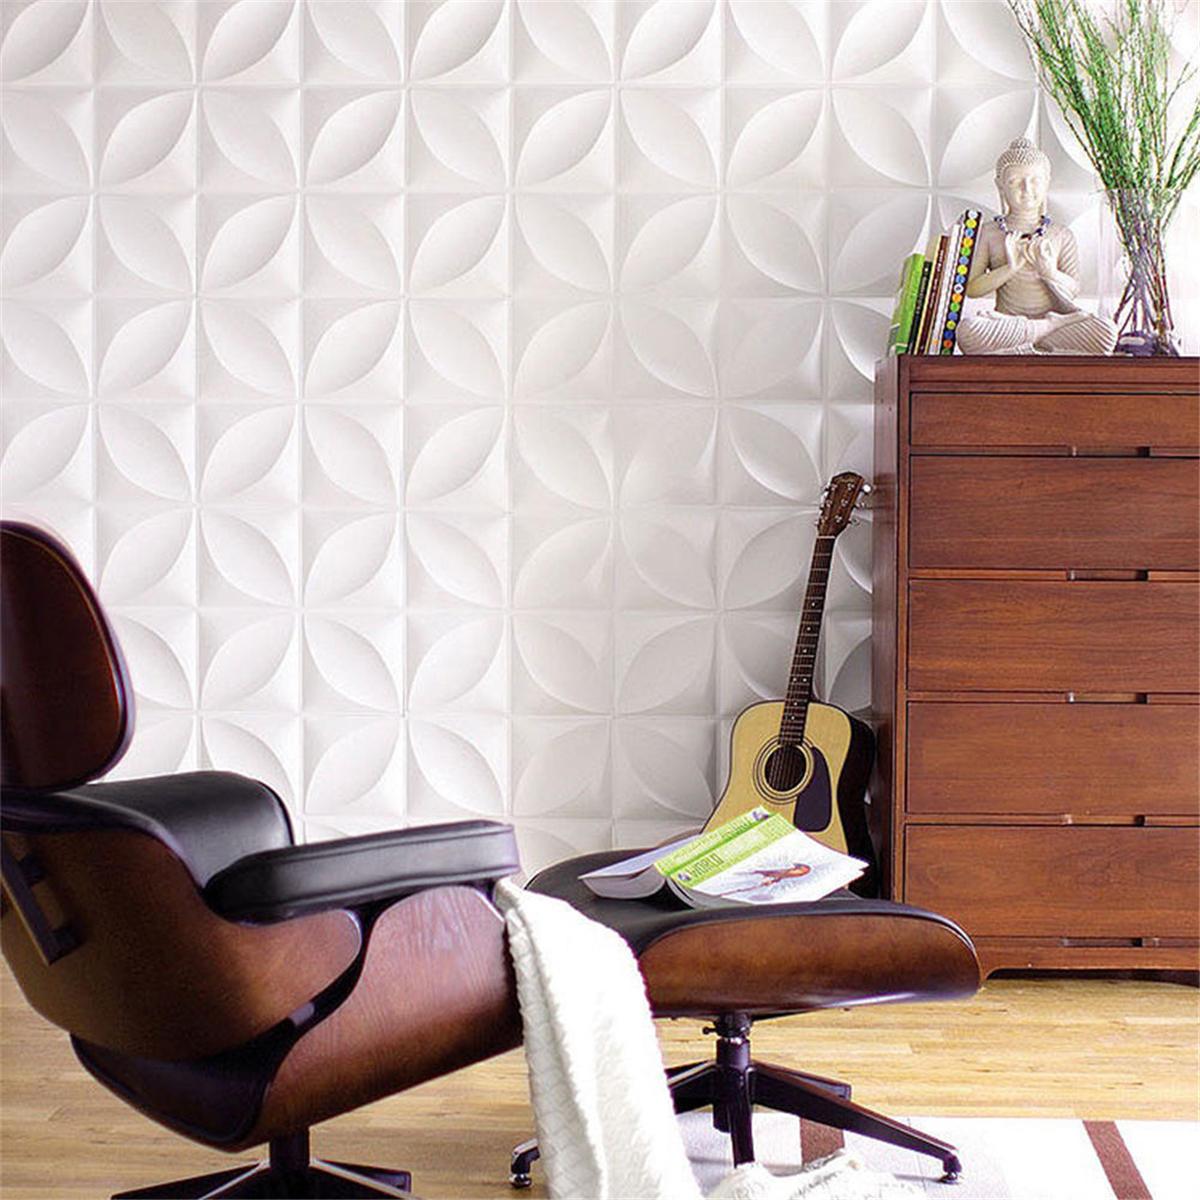 12pcs/set 3D Wall Panel Decoration Ceiling Tiles Wall paper Background Decor